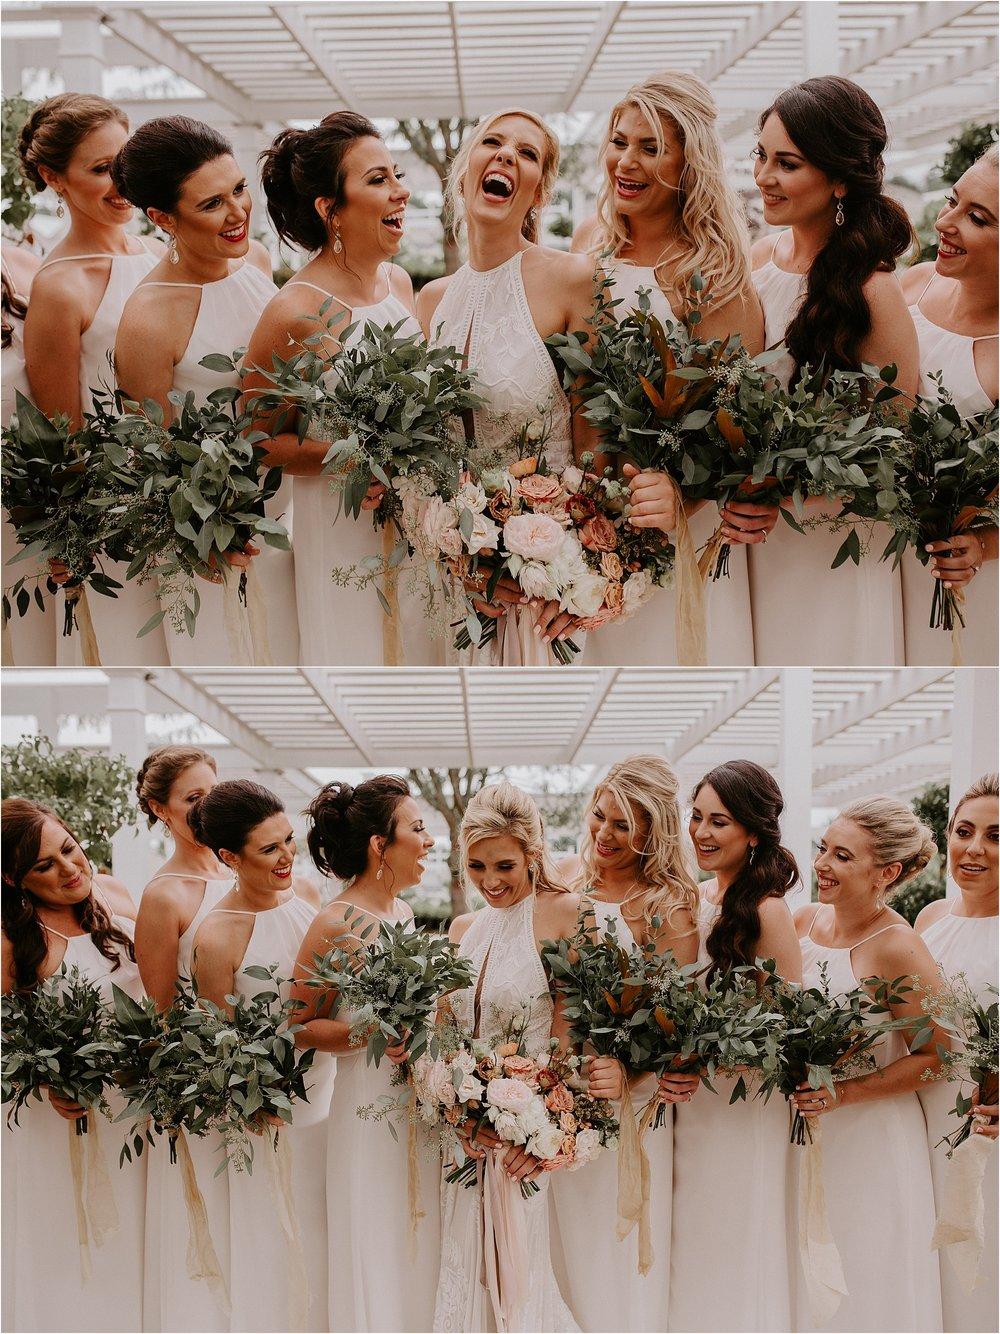 Sarah_Brookhart_Hortulus_Farm_Garden_and_Nursey_Wedding_Photographer_0041.jpg